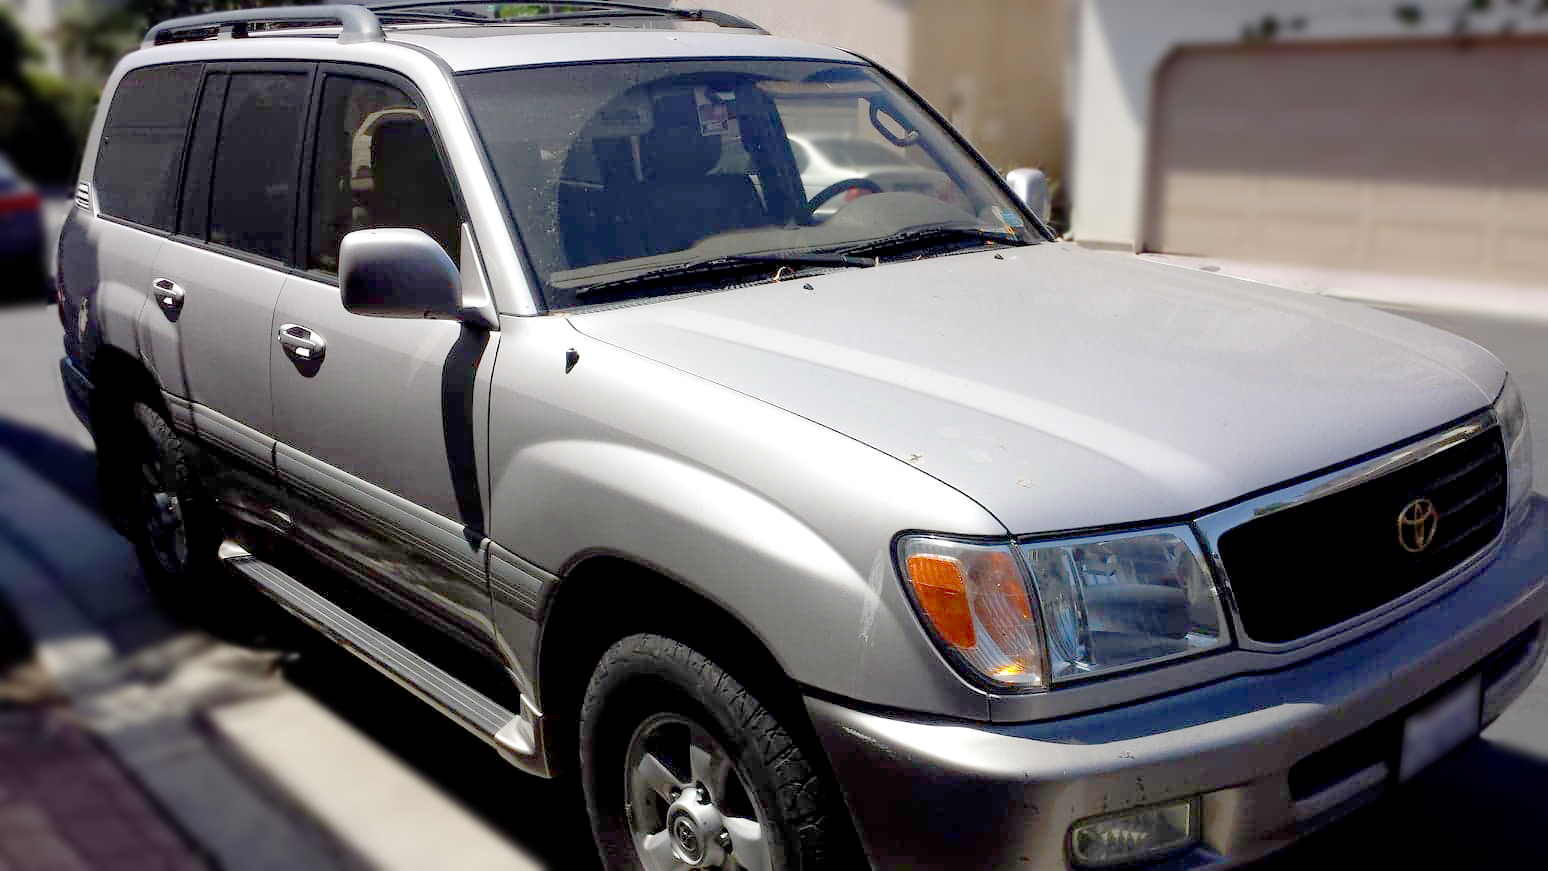 2001 toyota land cruiser - Toyota Nation Forum : Toyota Car and